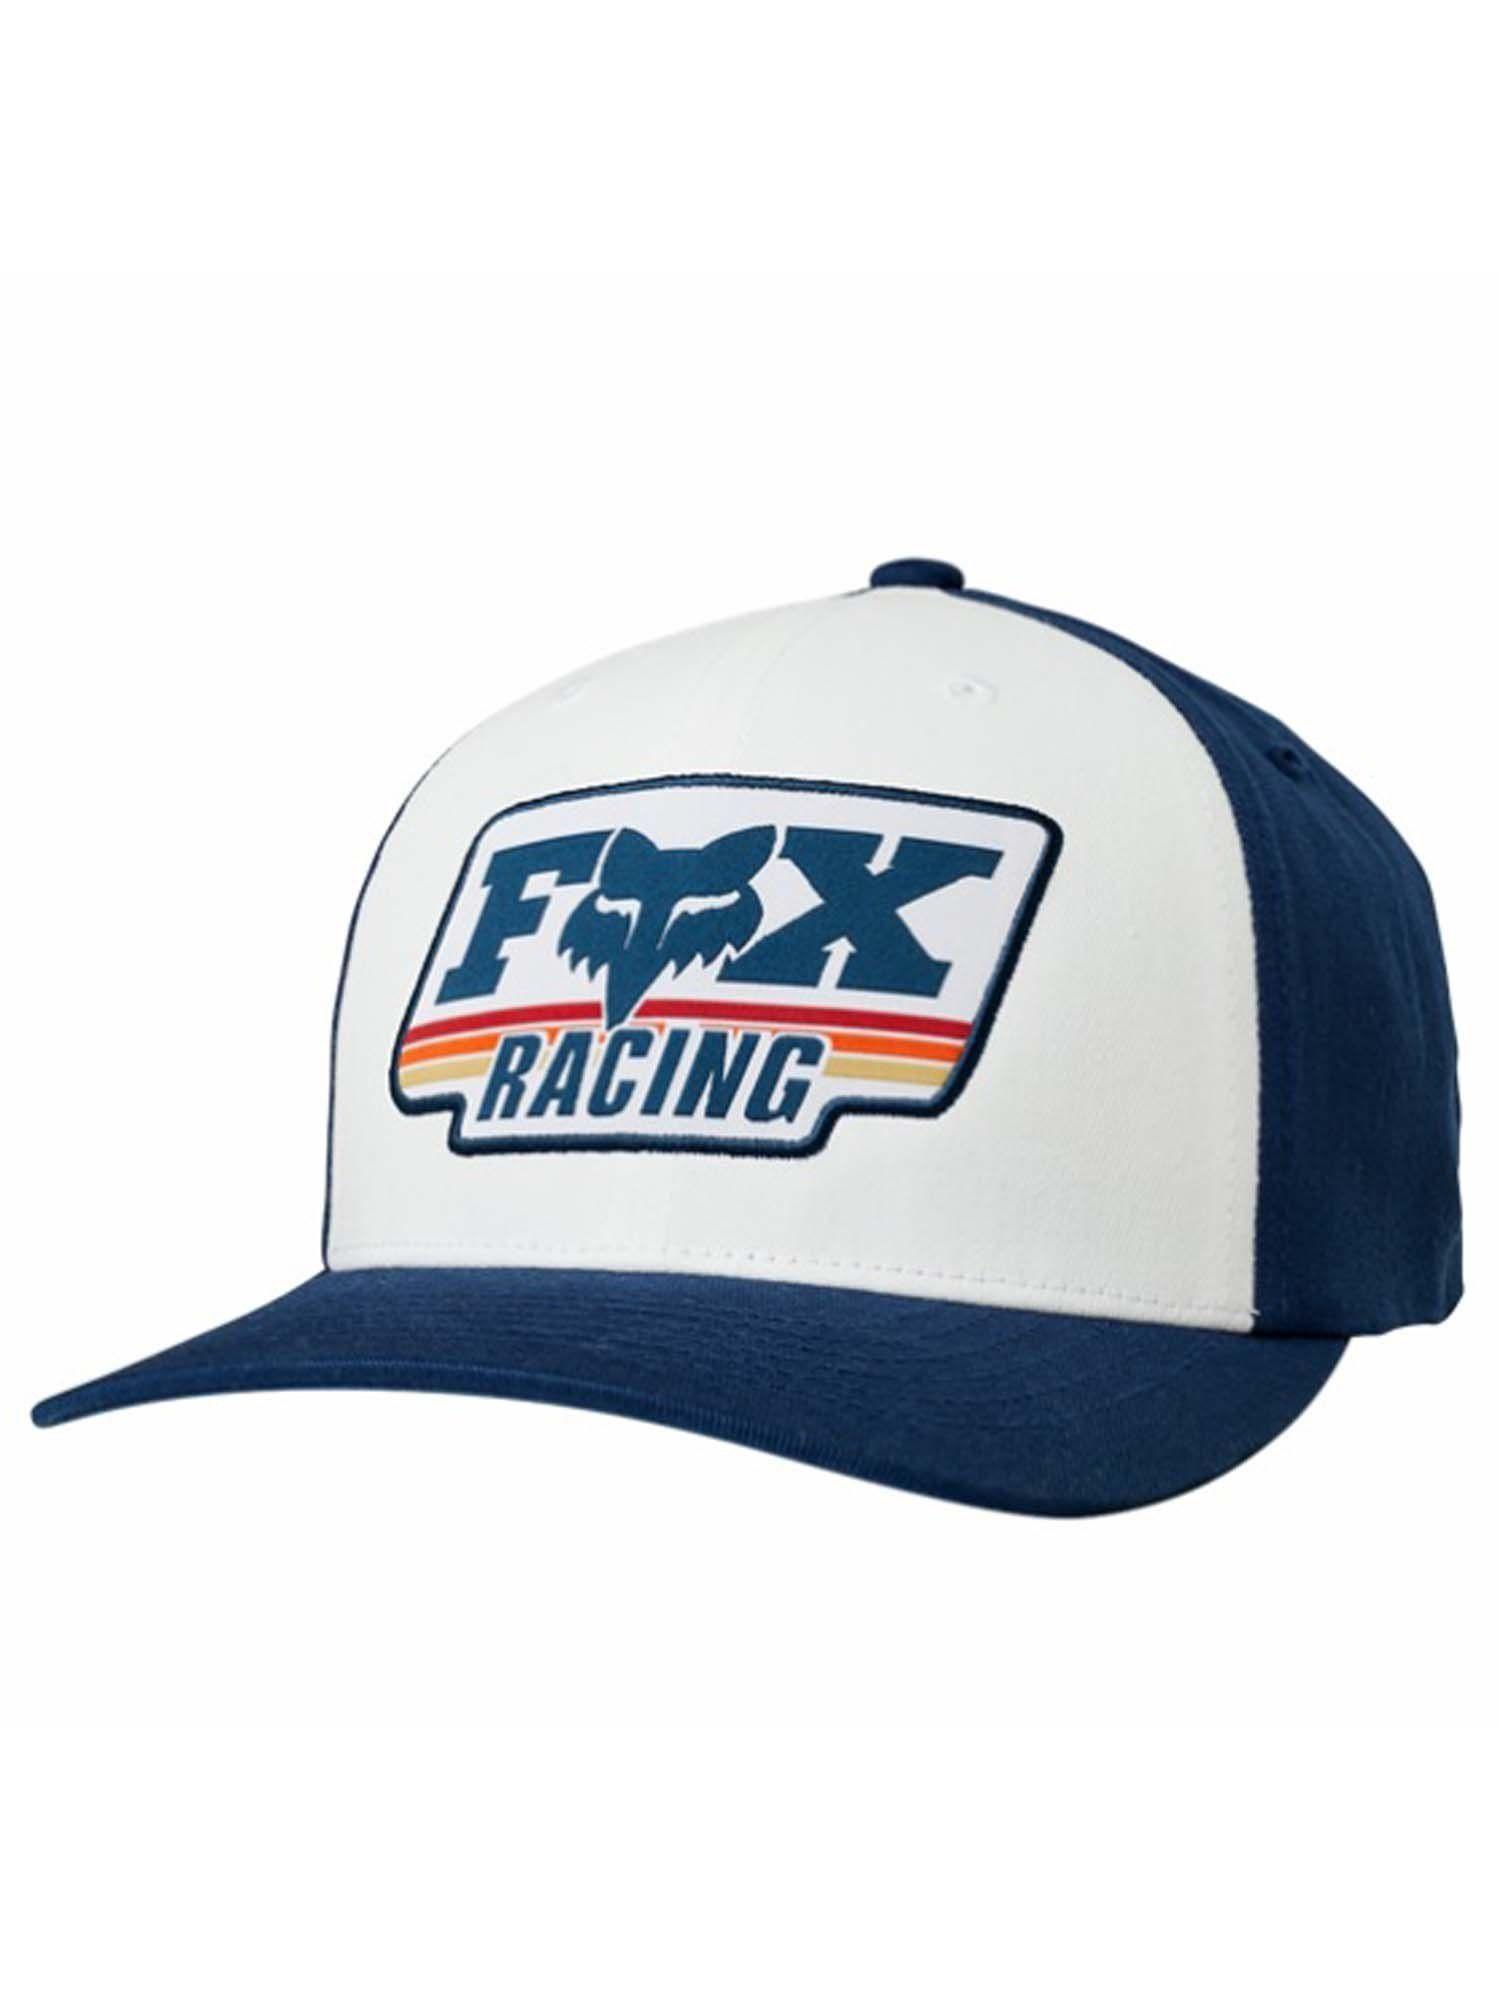 61612b0a Fox Racing Men's Throwback 110 Snapback Hat | Products | Snapback ...